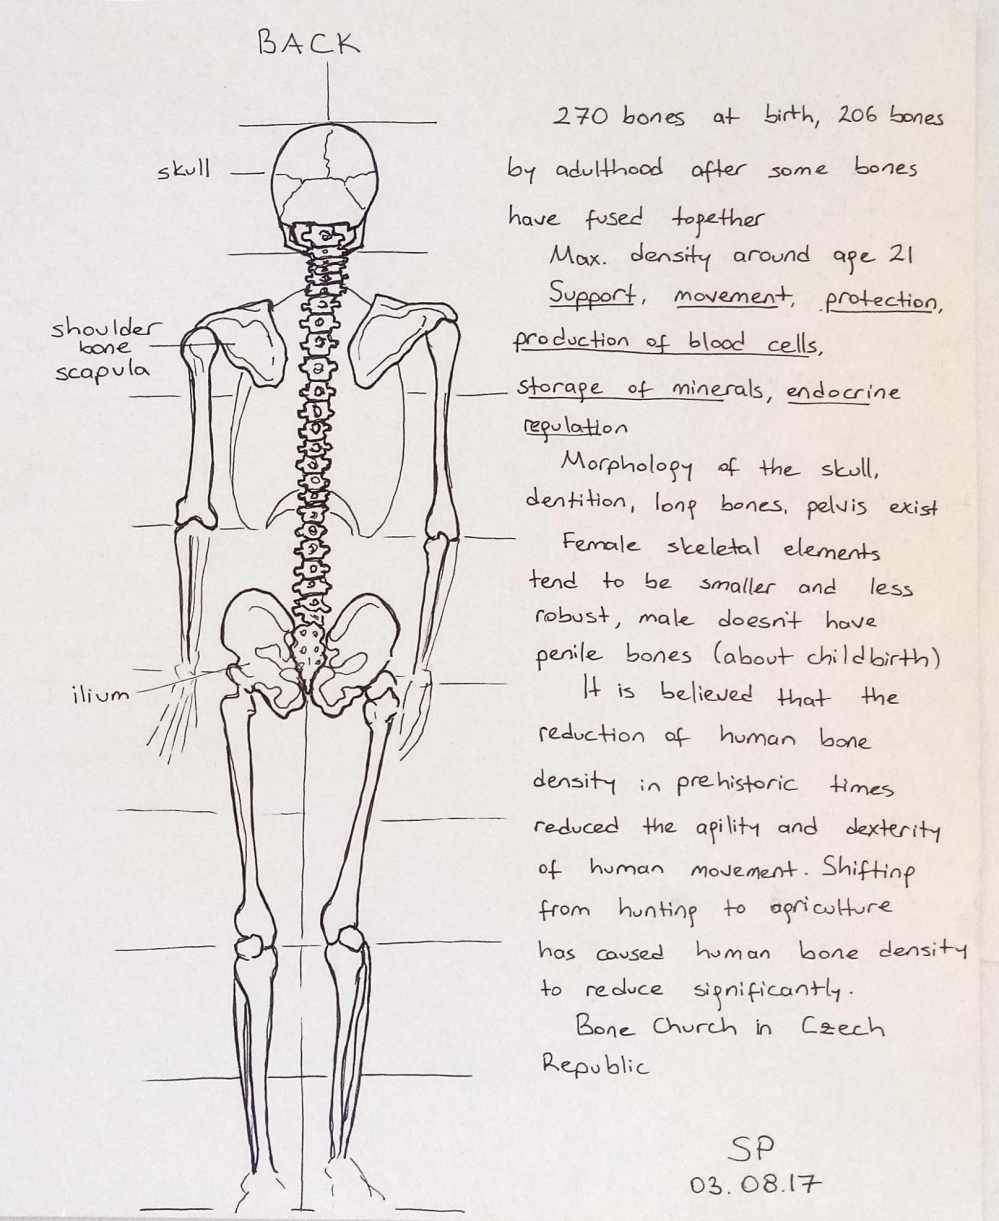 skeleton drawing back